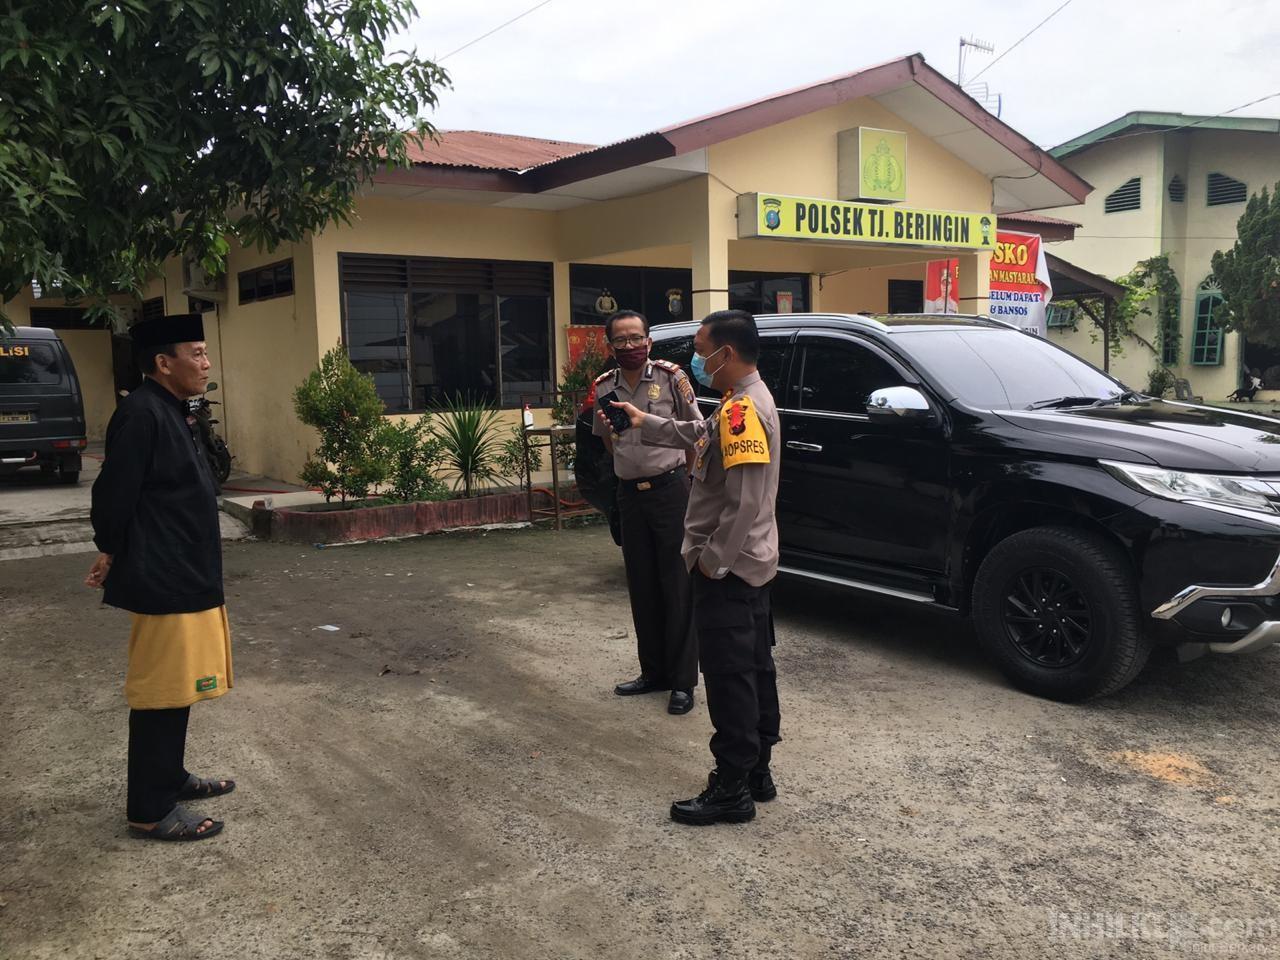 Kapolres AKBP Robin Simatupang Cek Polsek Jajaran dan Pos Pengamanan